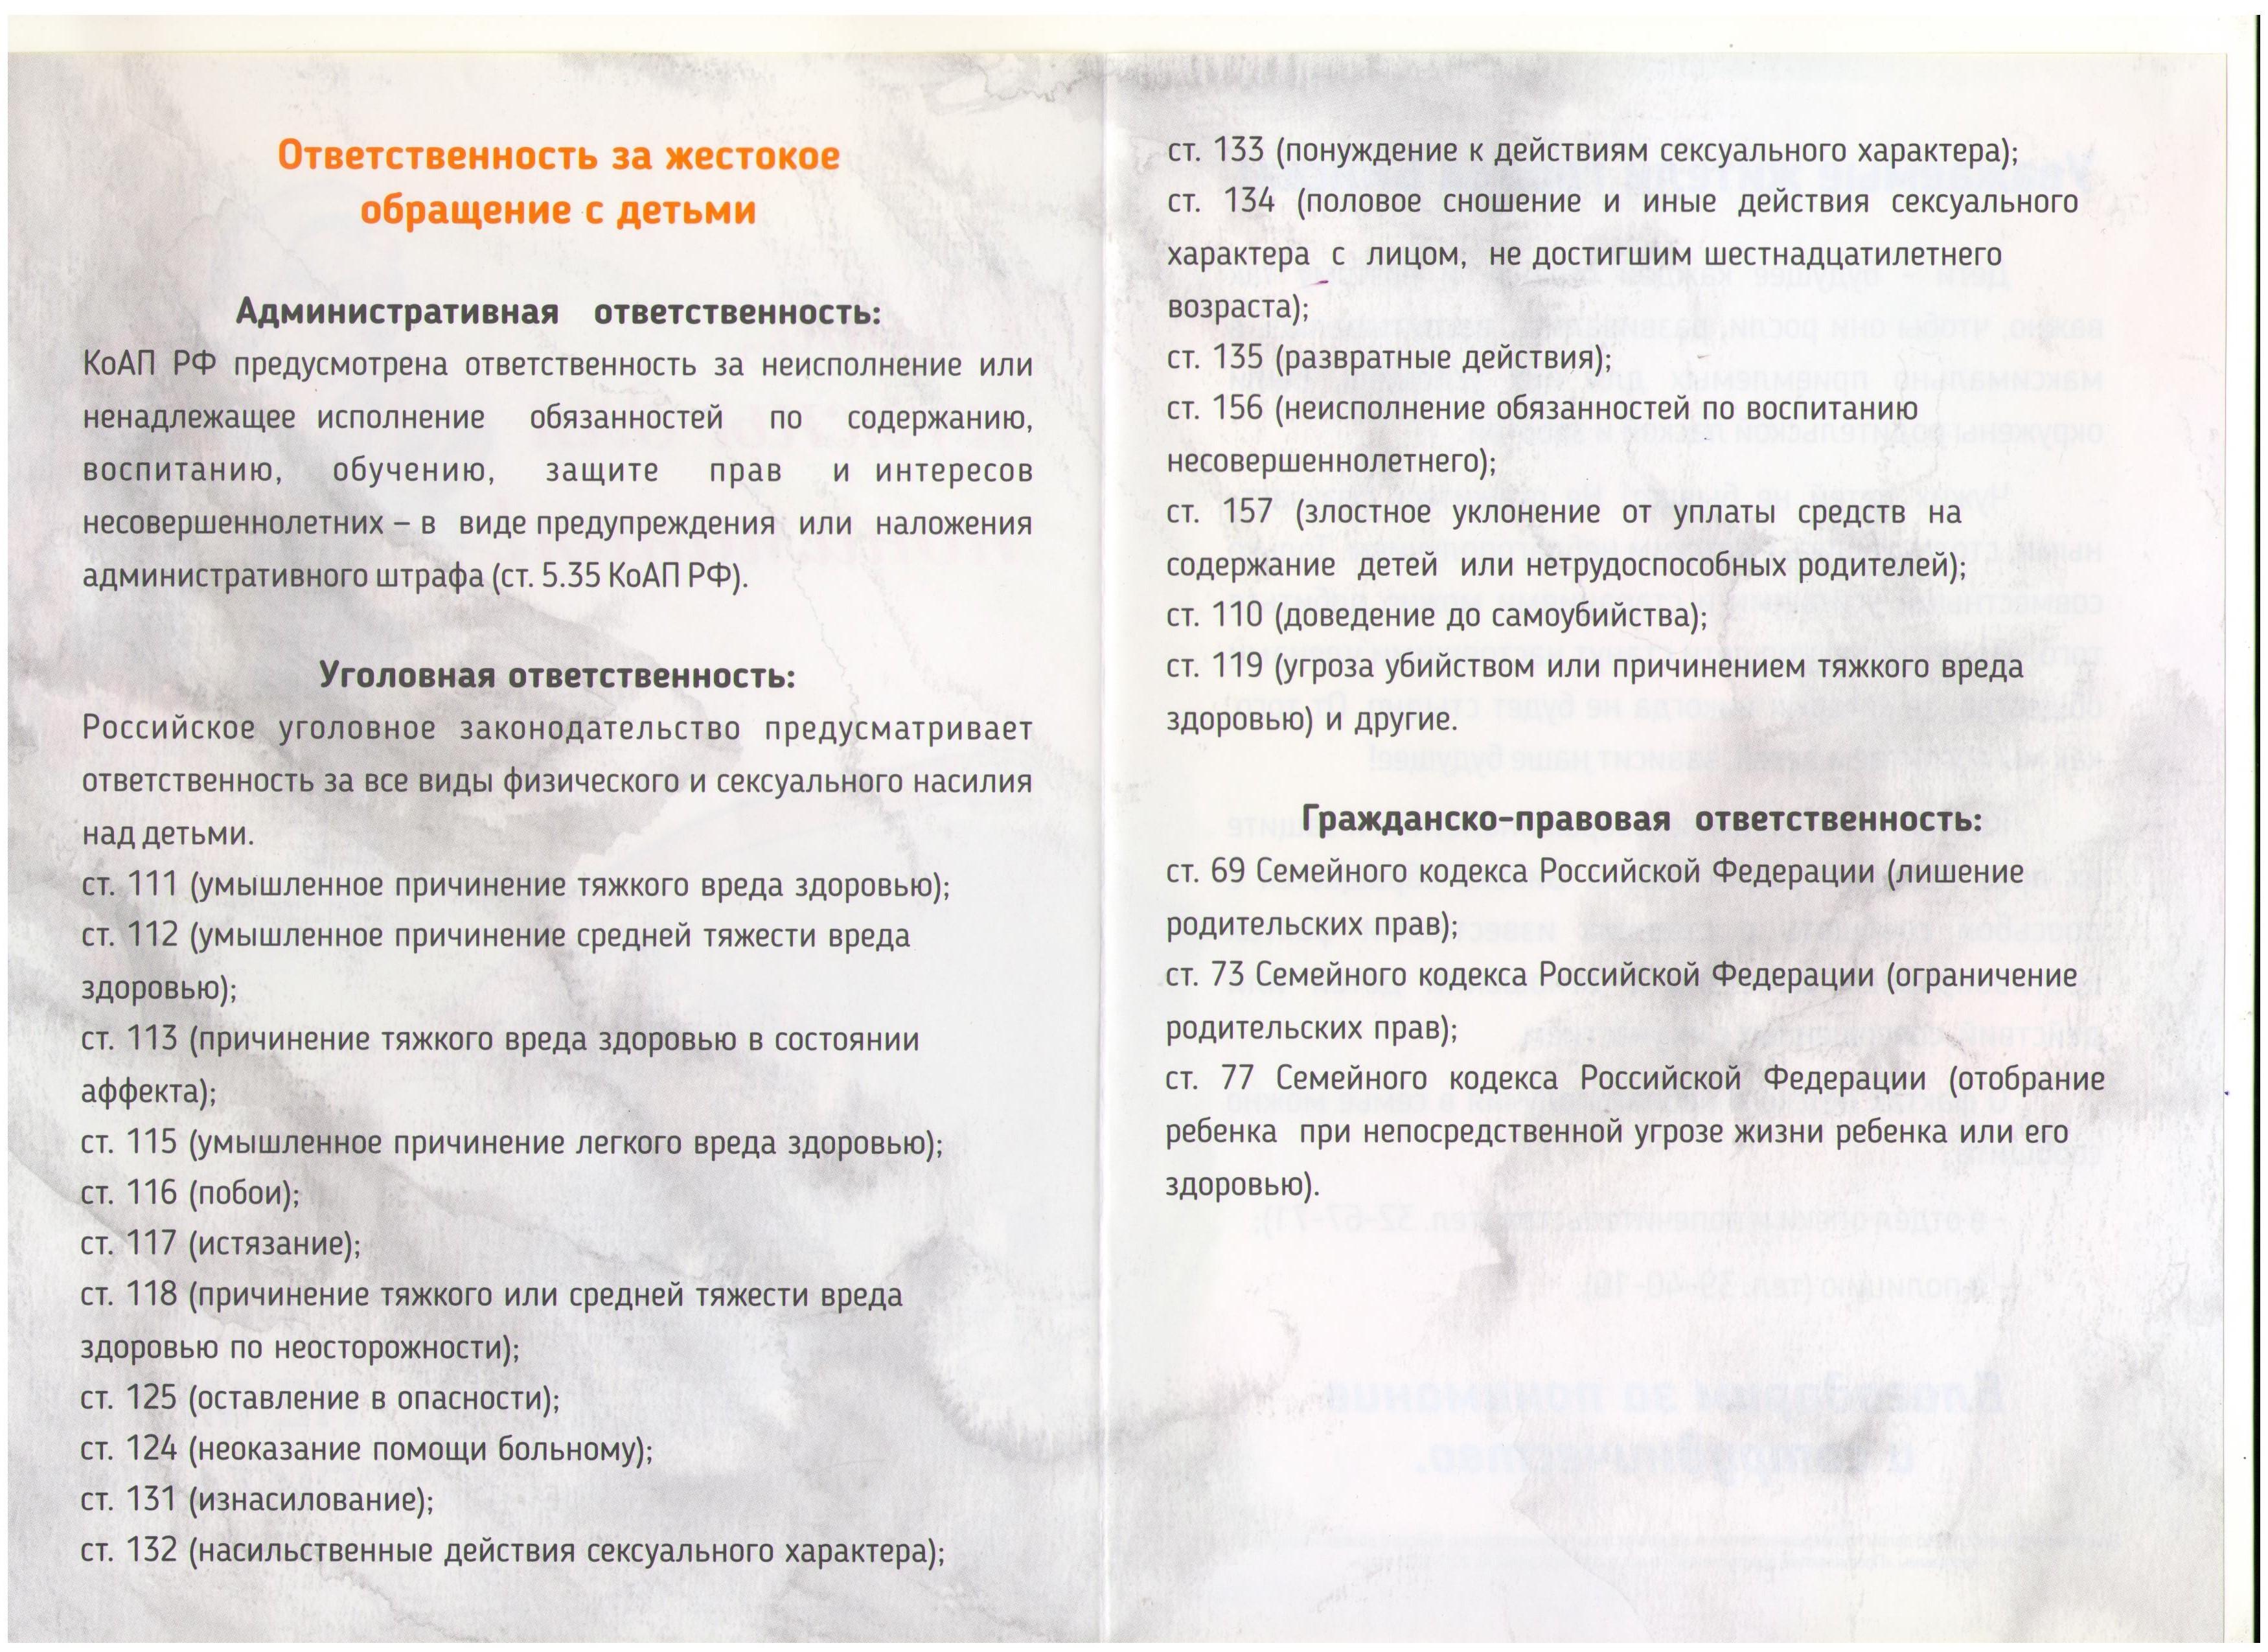 семейный кодекс ст 77